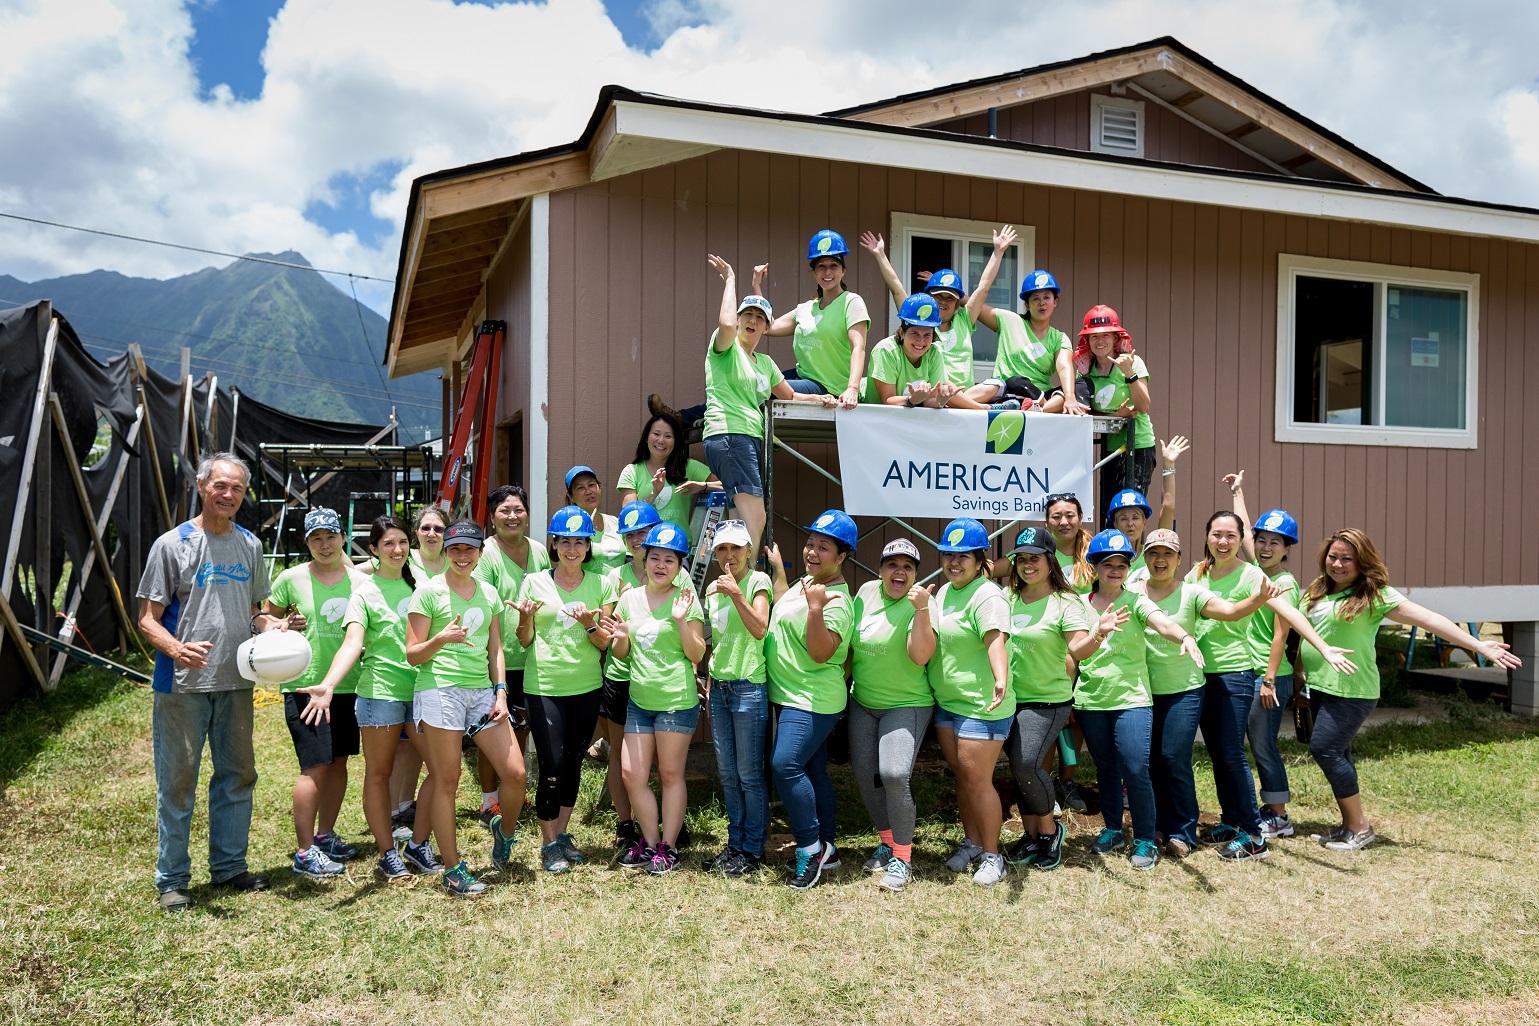 American Savings Bank Wahine Help Build New Habitat Home